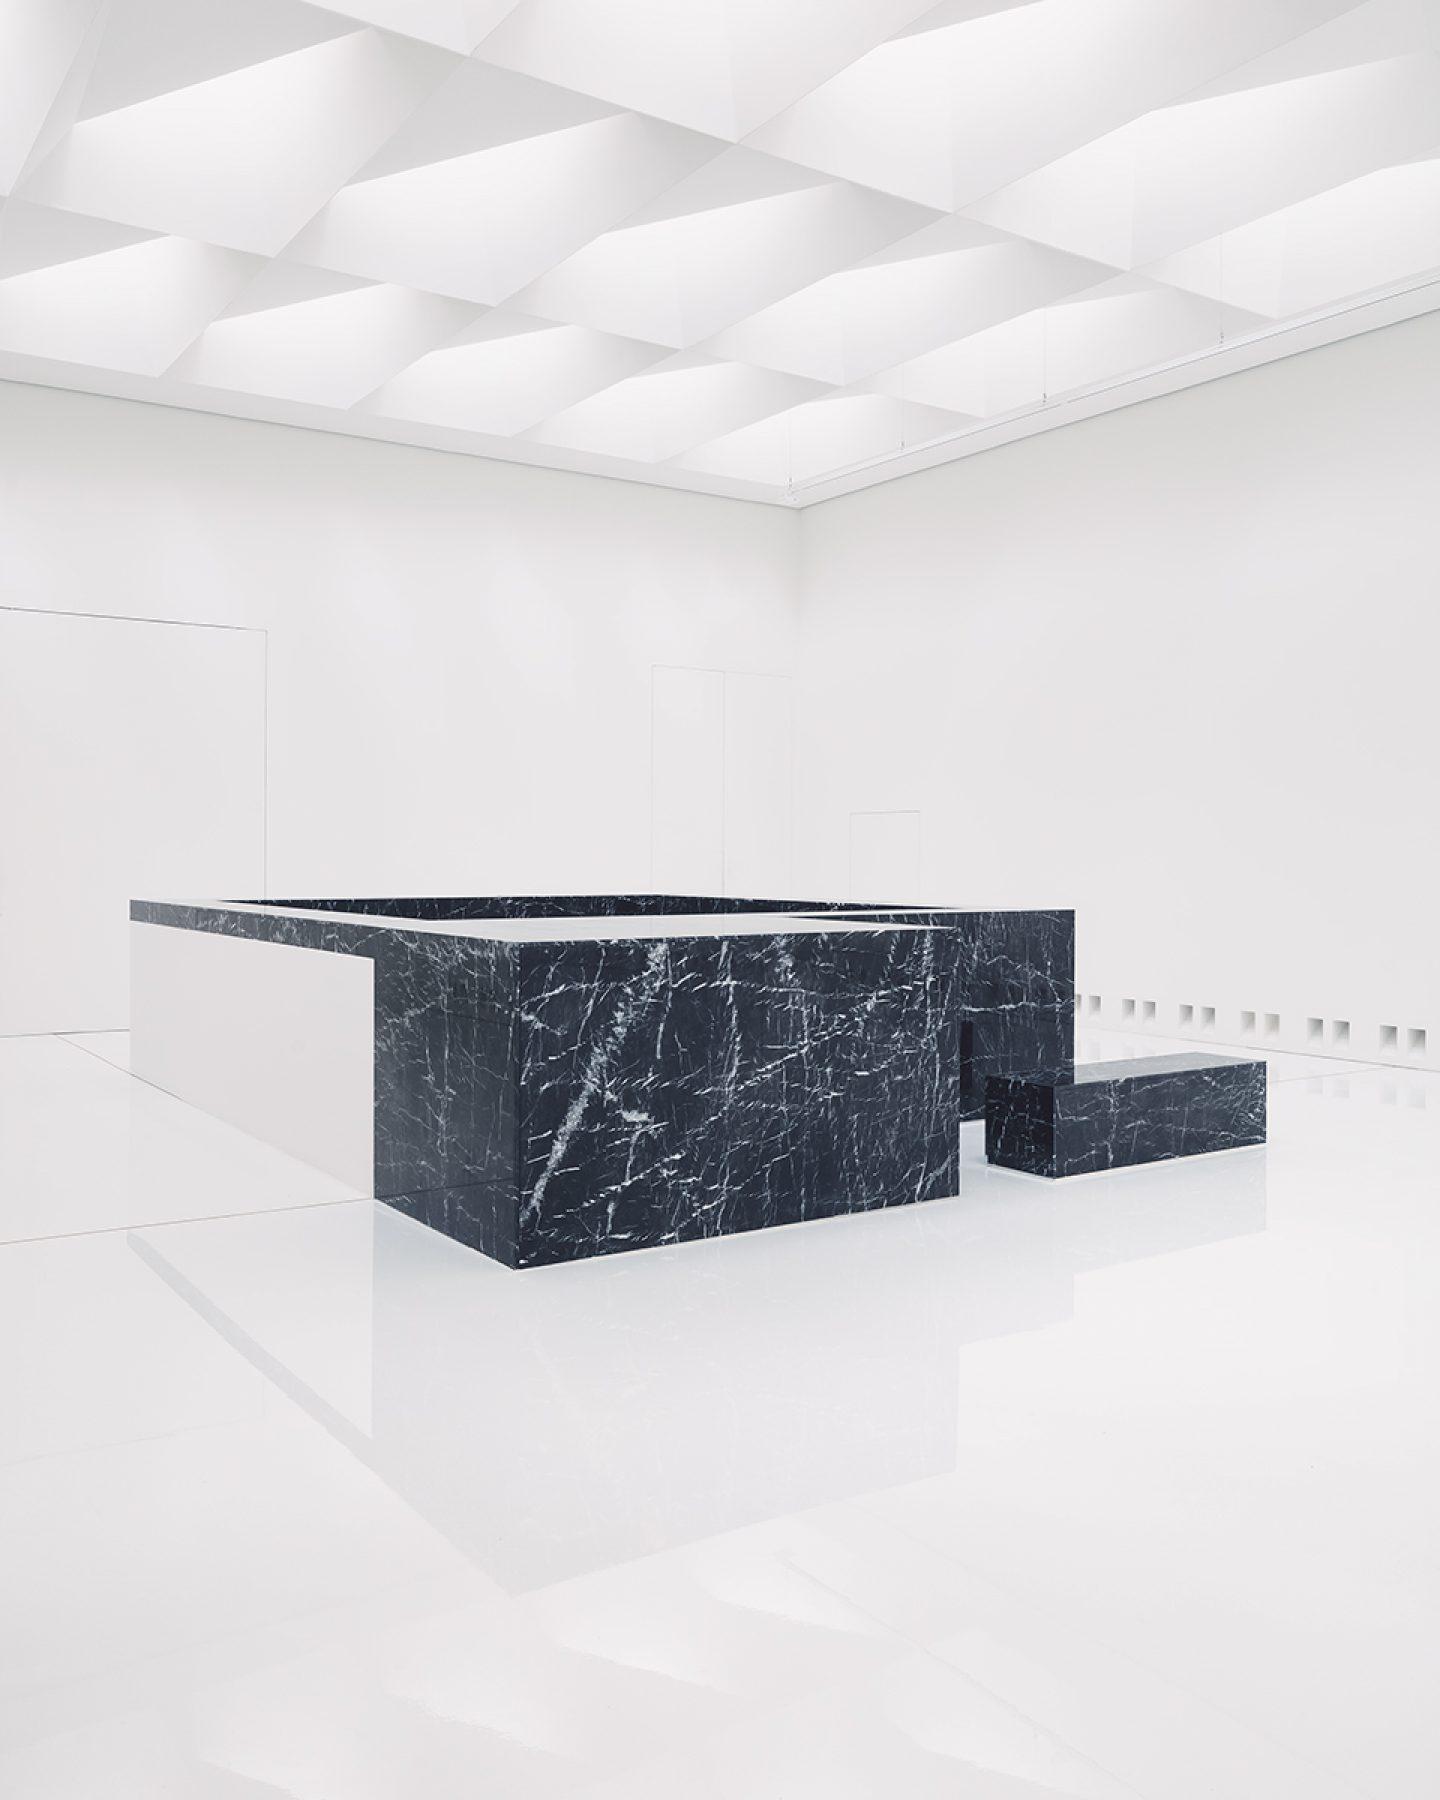 IGNANT-Travel-Kaan-Architekten-KMSKA-015